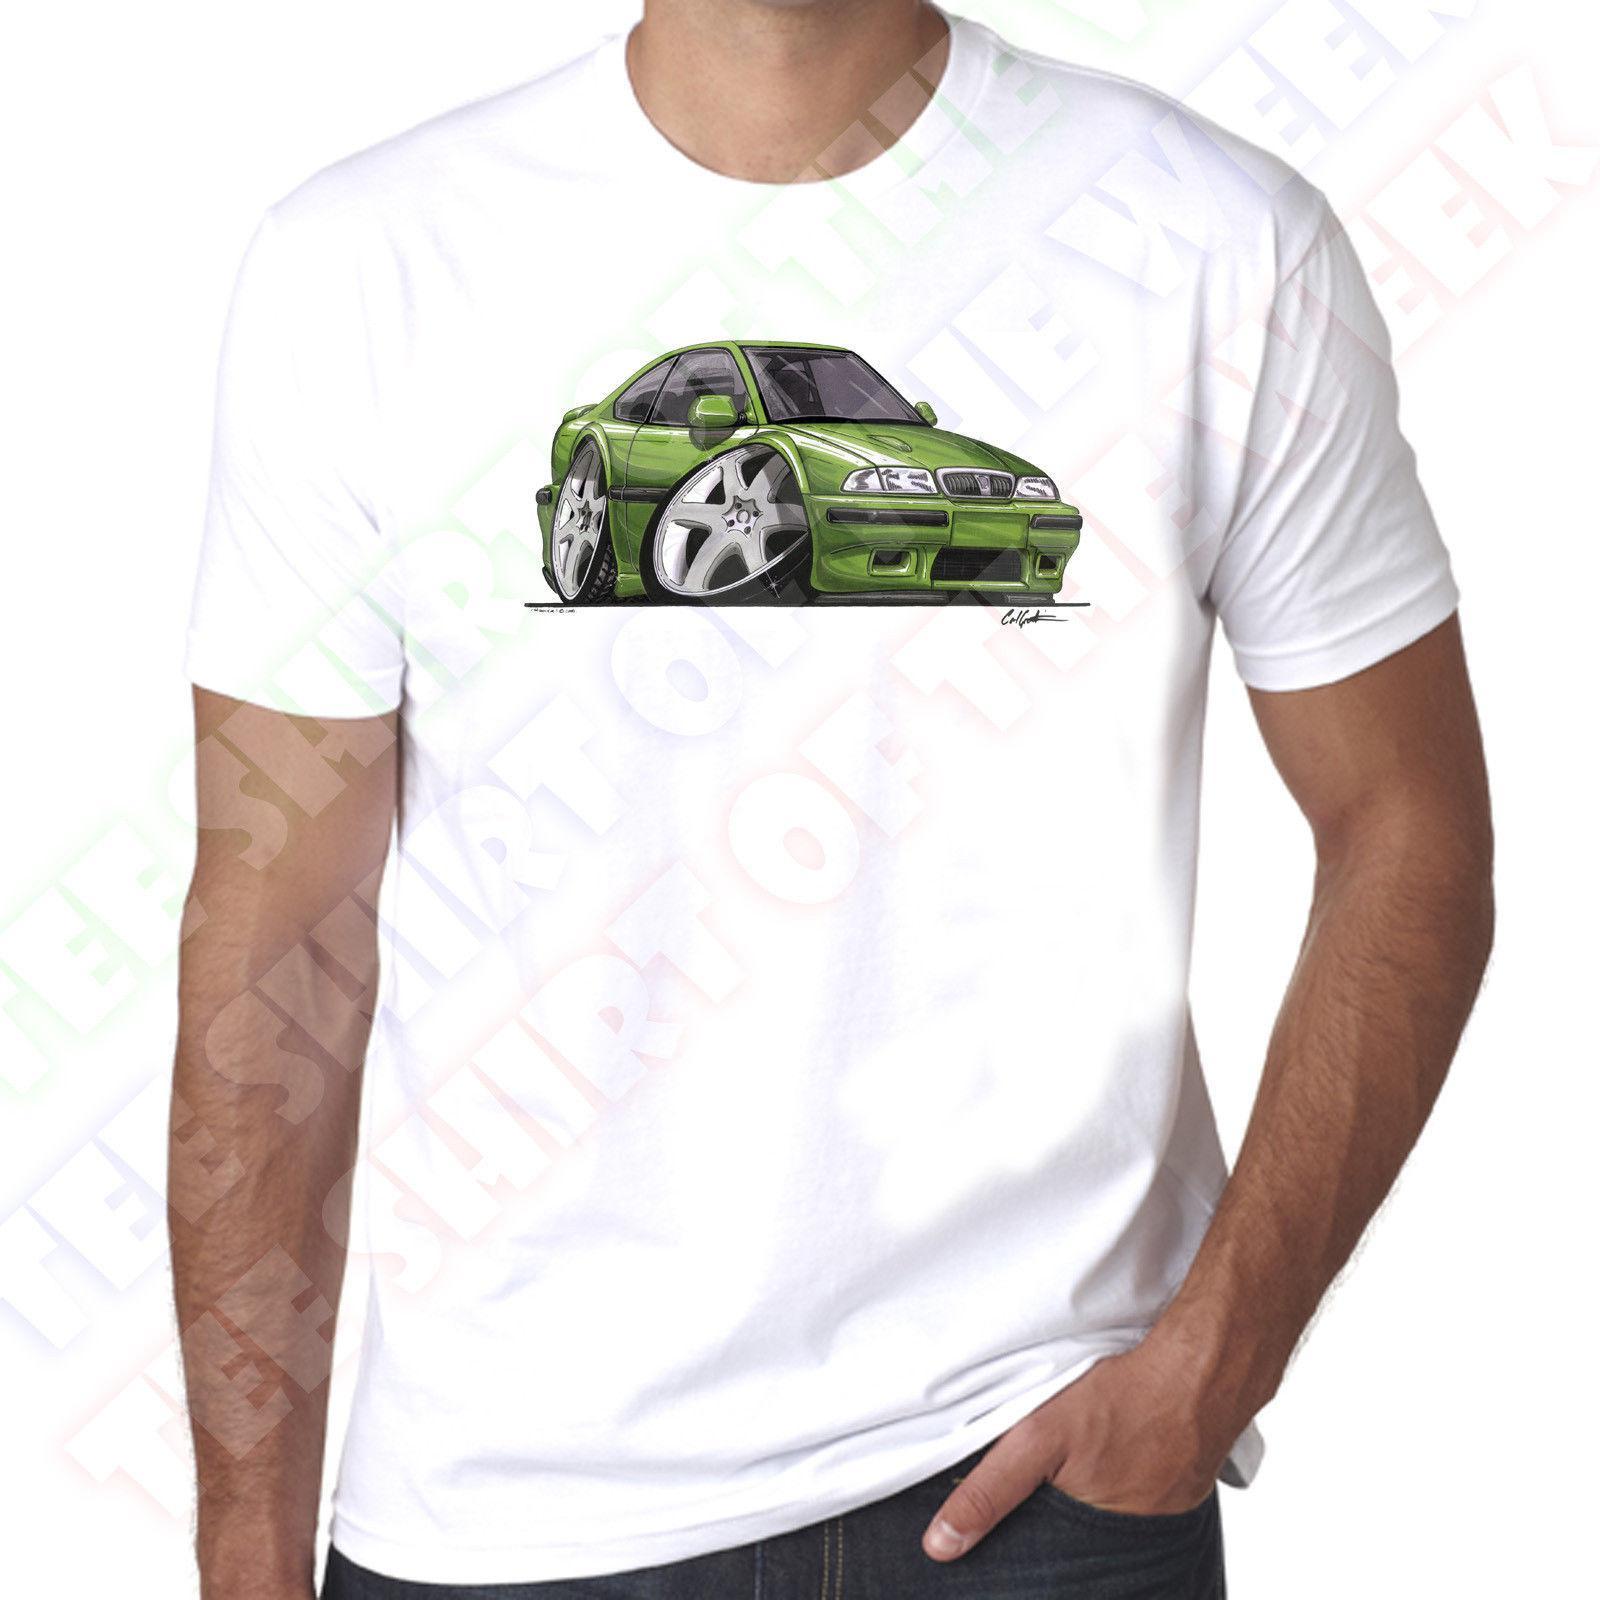 a5268bde WickedArtz Cartoon Car Green Rover 220 Coupe Mens 100% Cotton White T Shirt  2018 Hot Summer Casual T Tees Print Rude T Shirt Shirt With T Shirt From ...